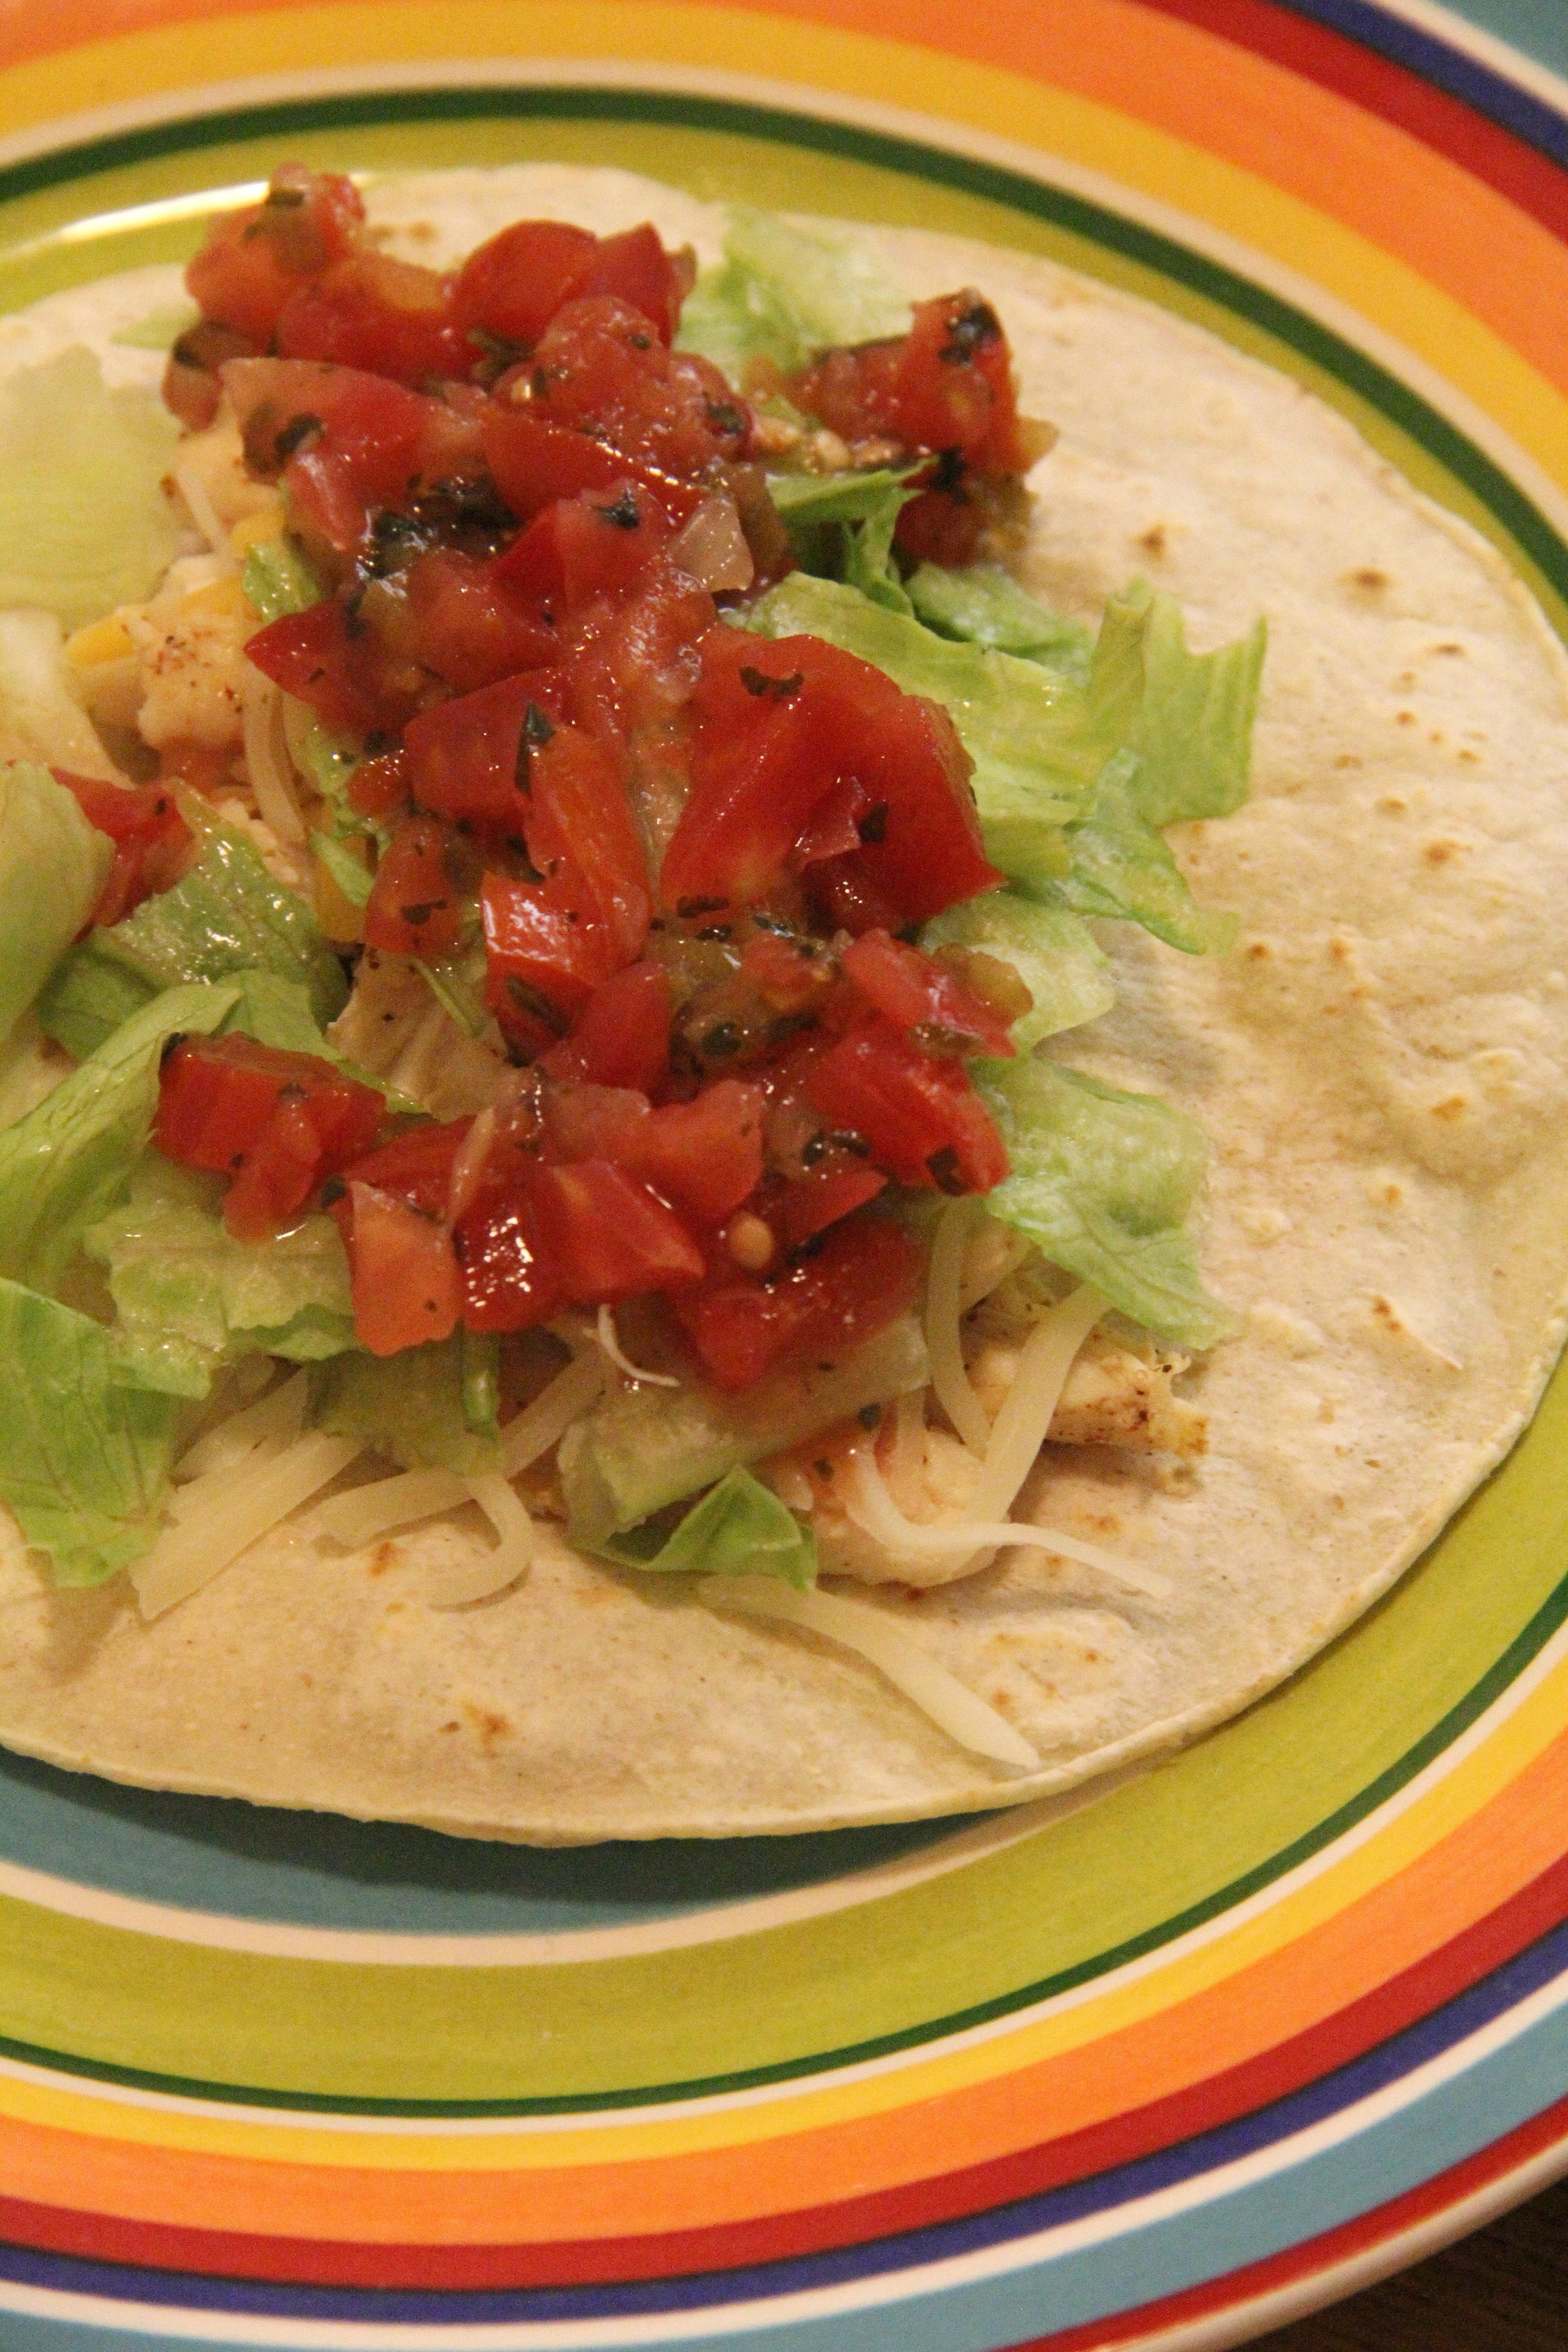 Chili Chicken Soft Tacos